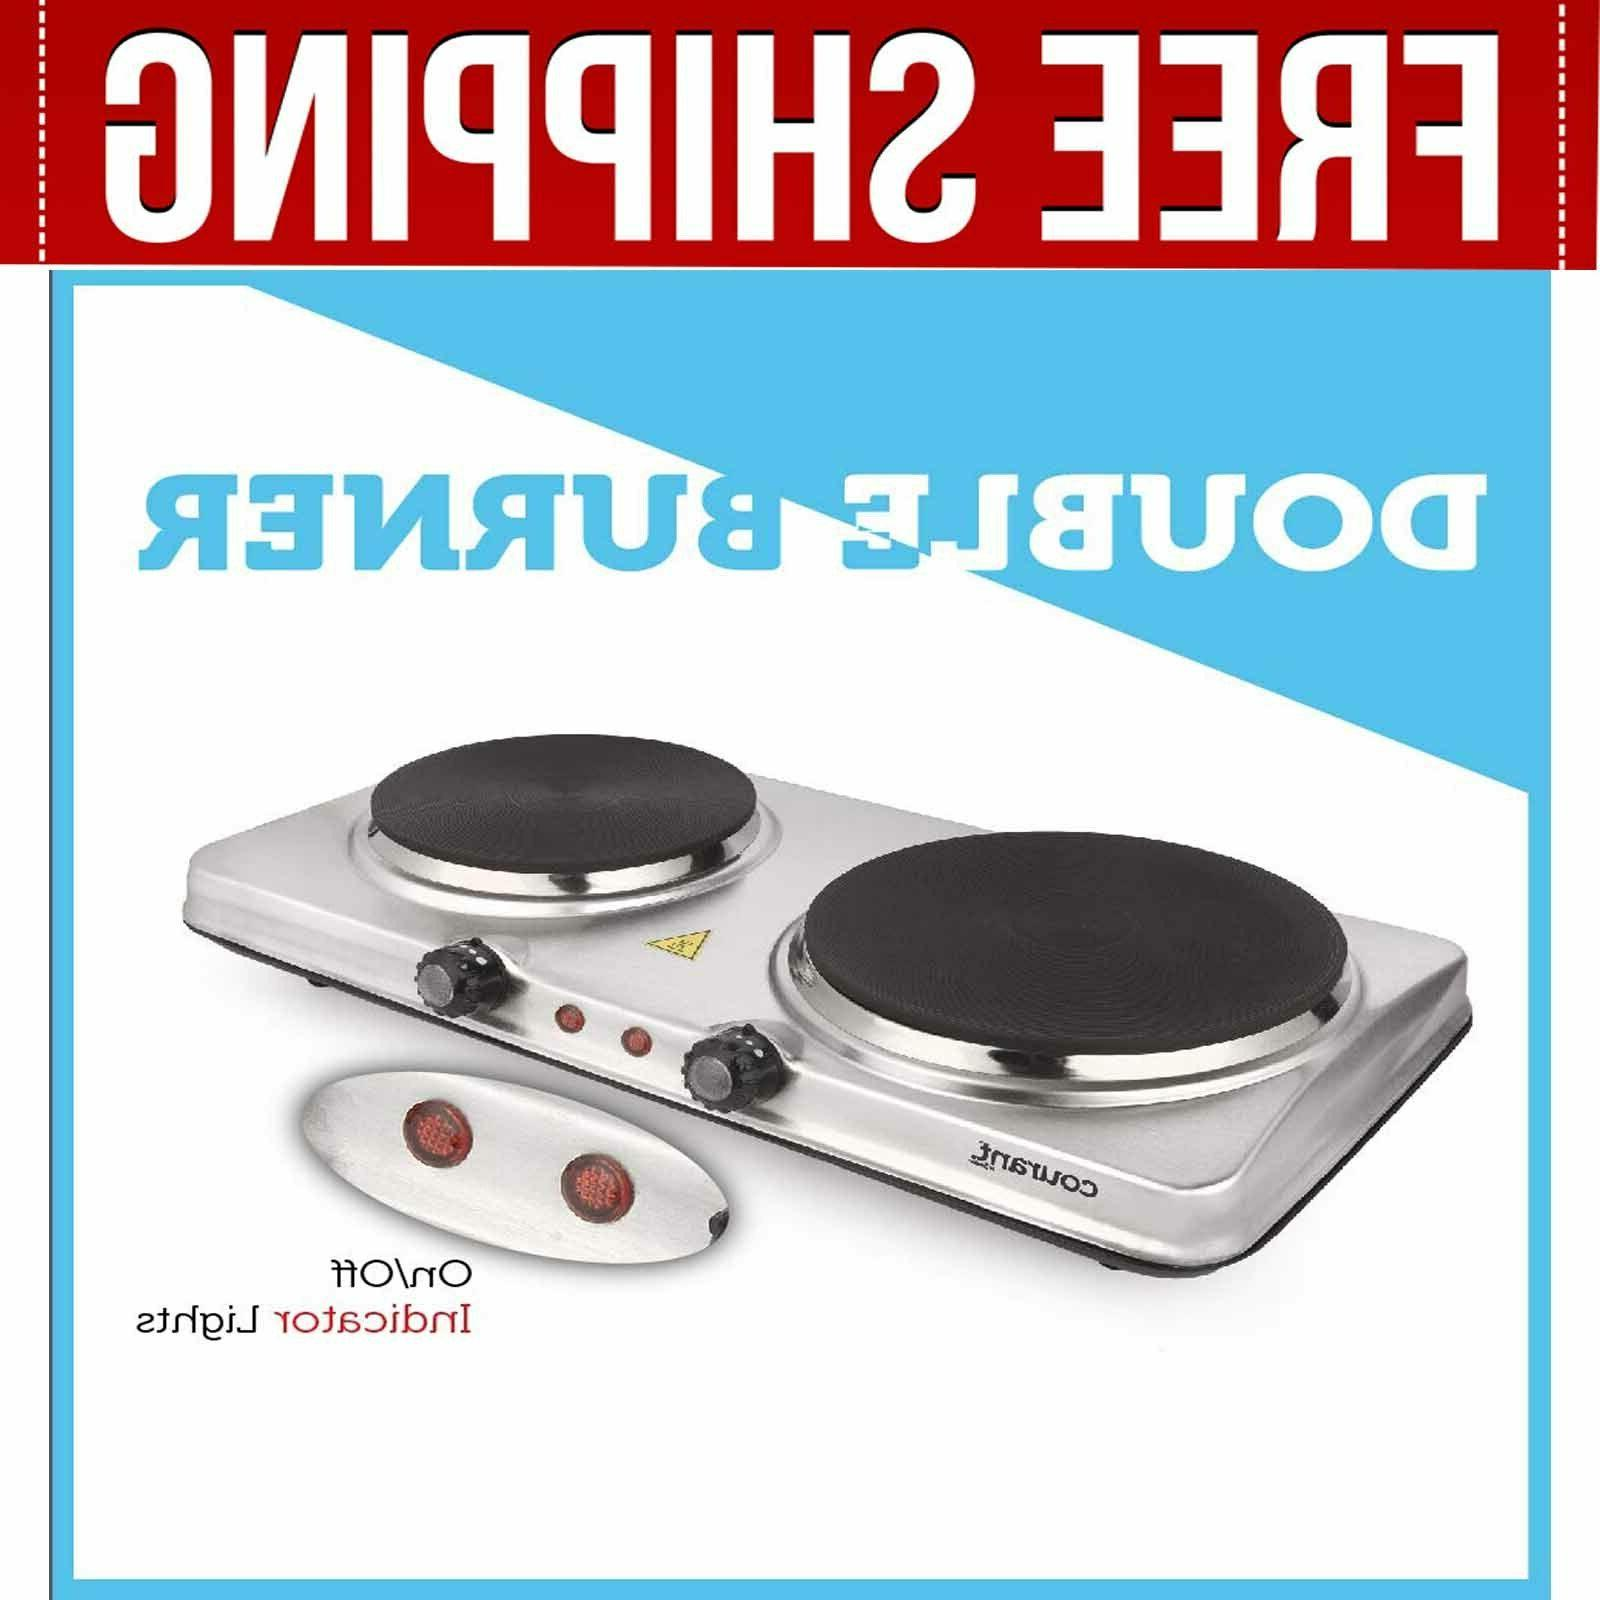 Electric Cooktop Burner Burners Kitchen